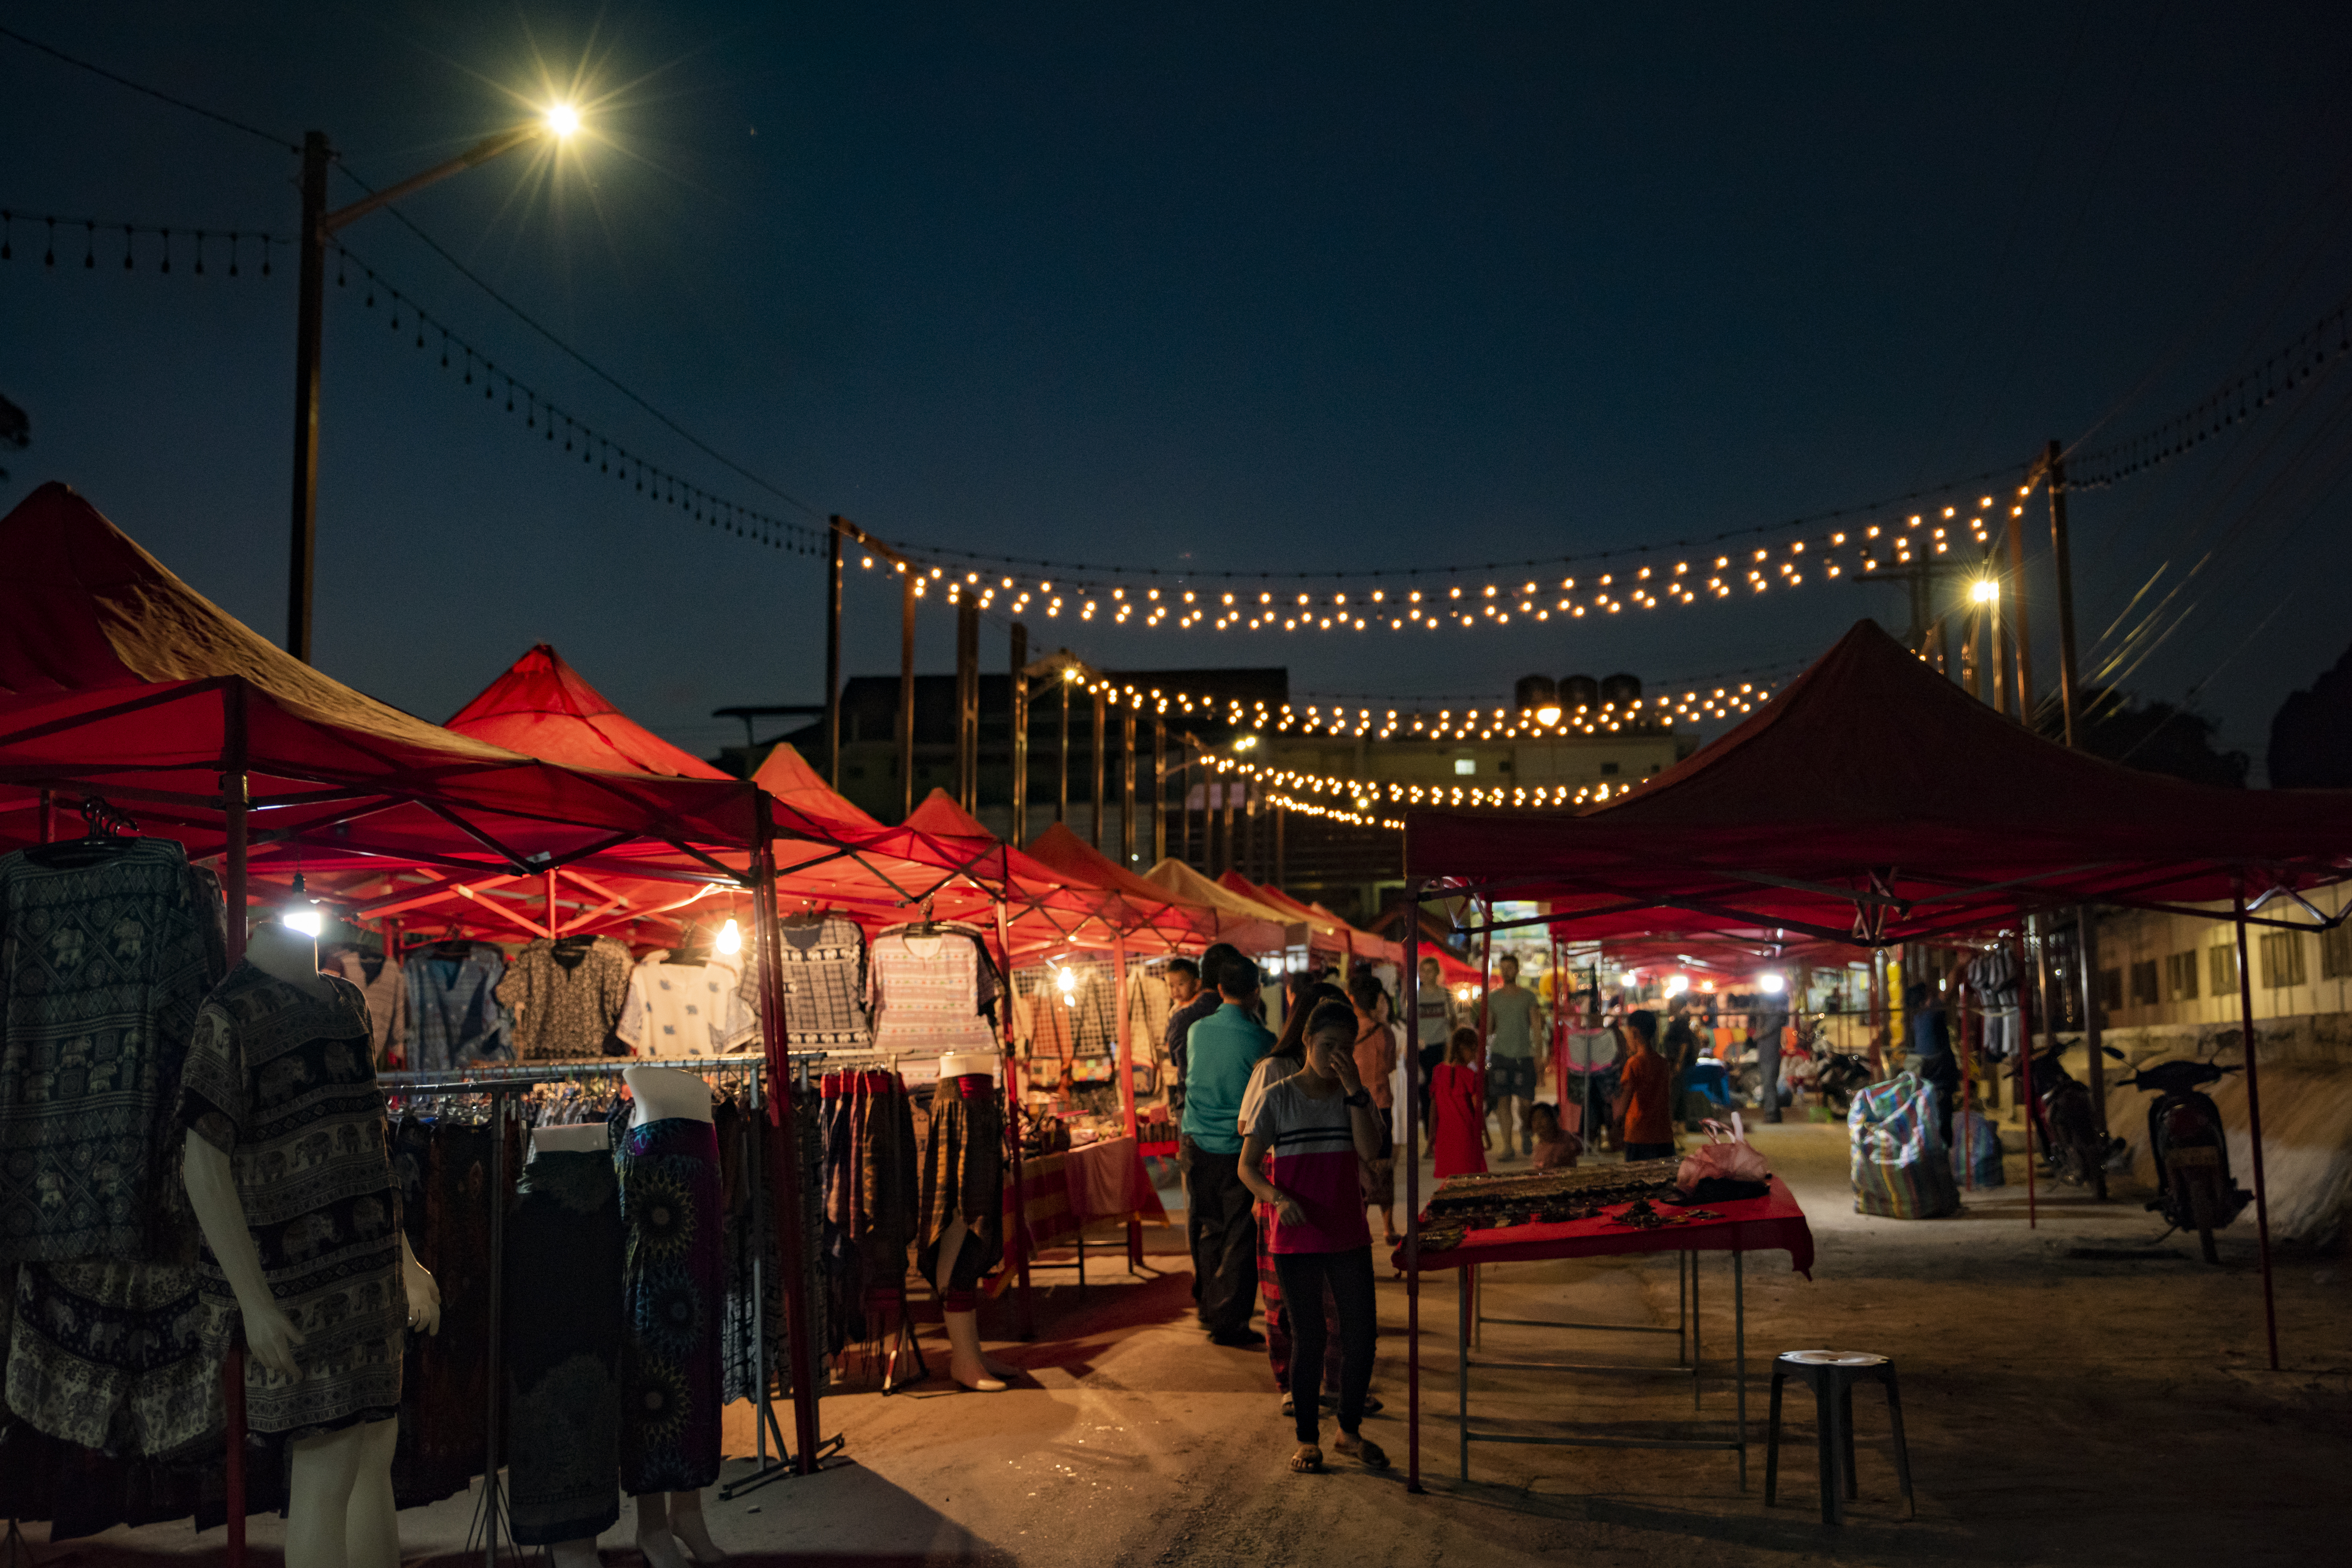 Night street - Vang Vieng, laos